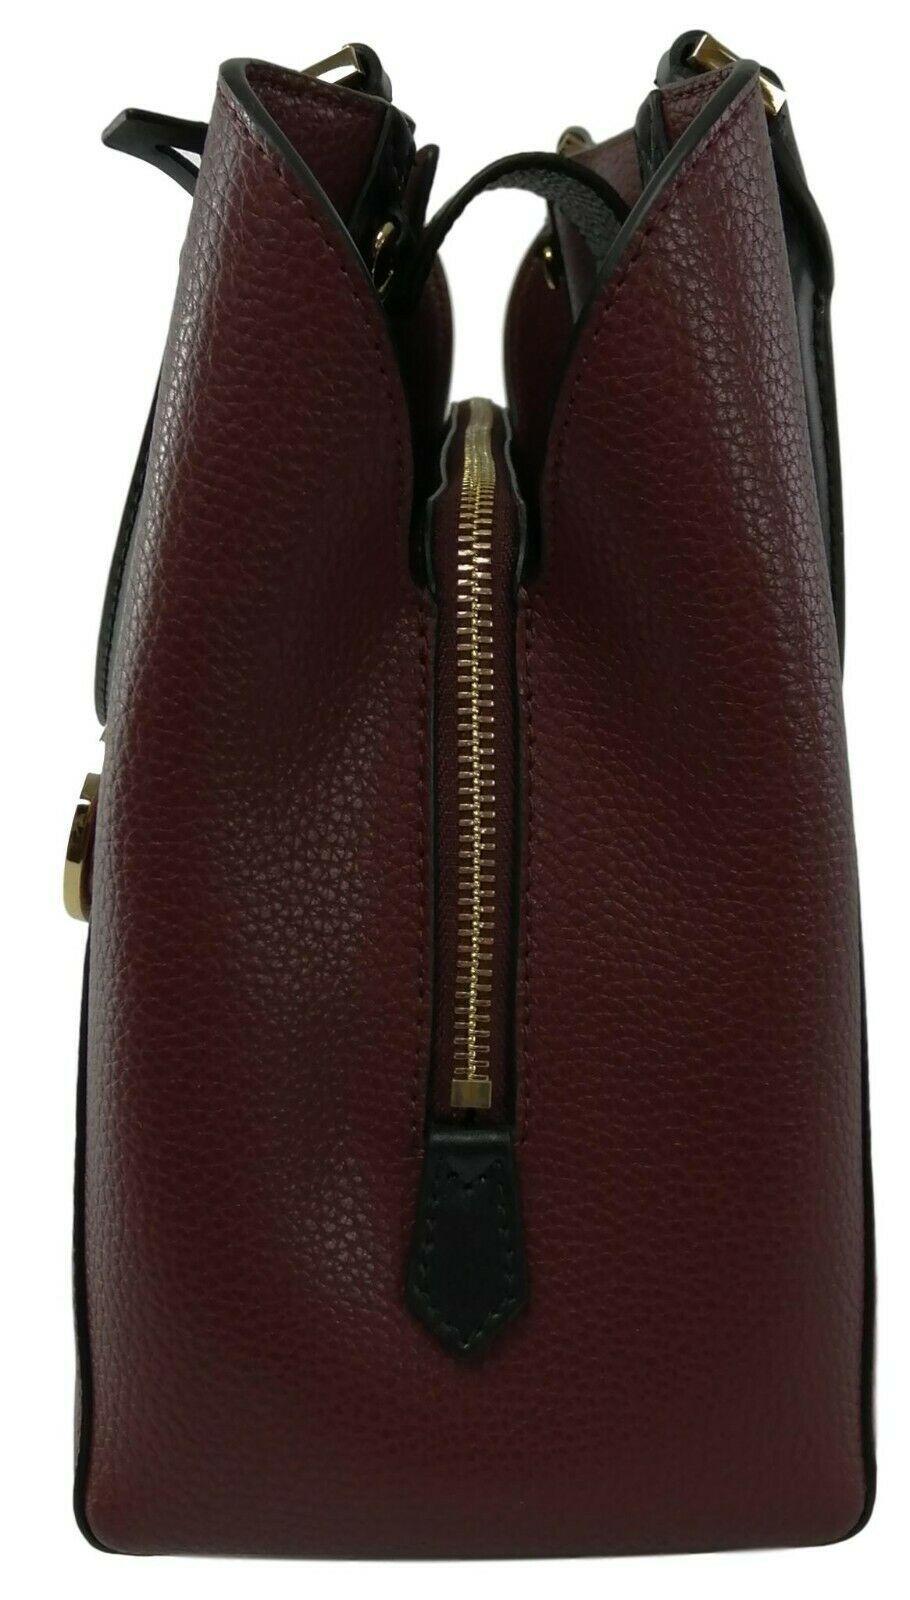 Michael Kors Cartella Top Manico Merlot pelle Rossa Kimberly Bag image 3